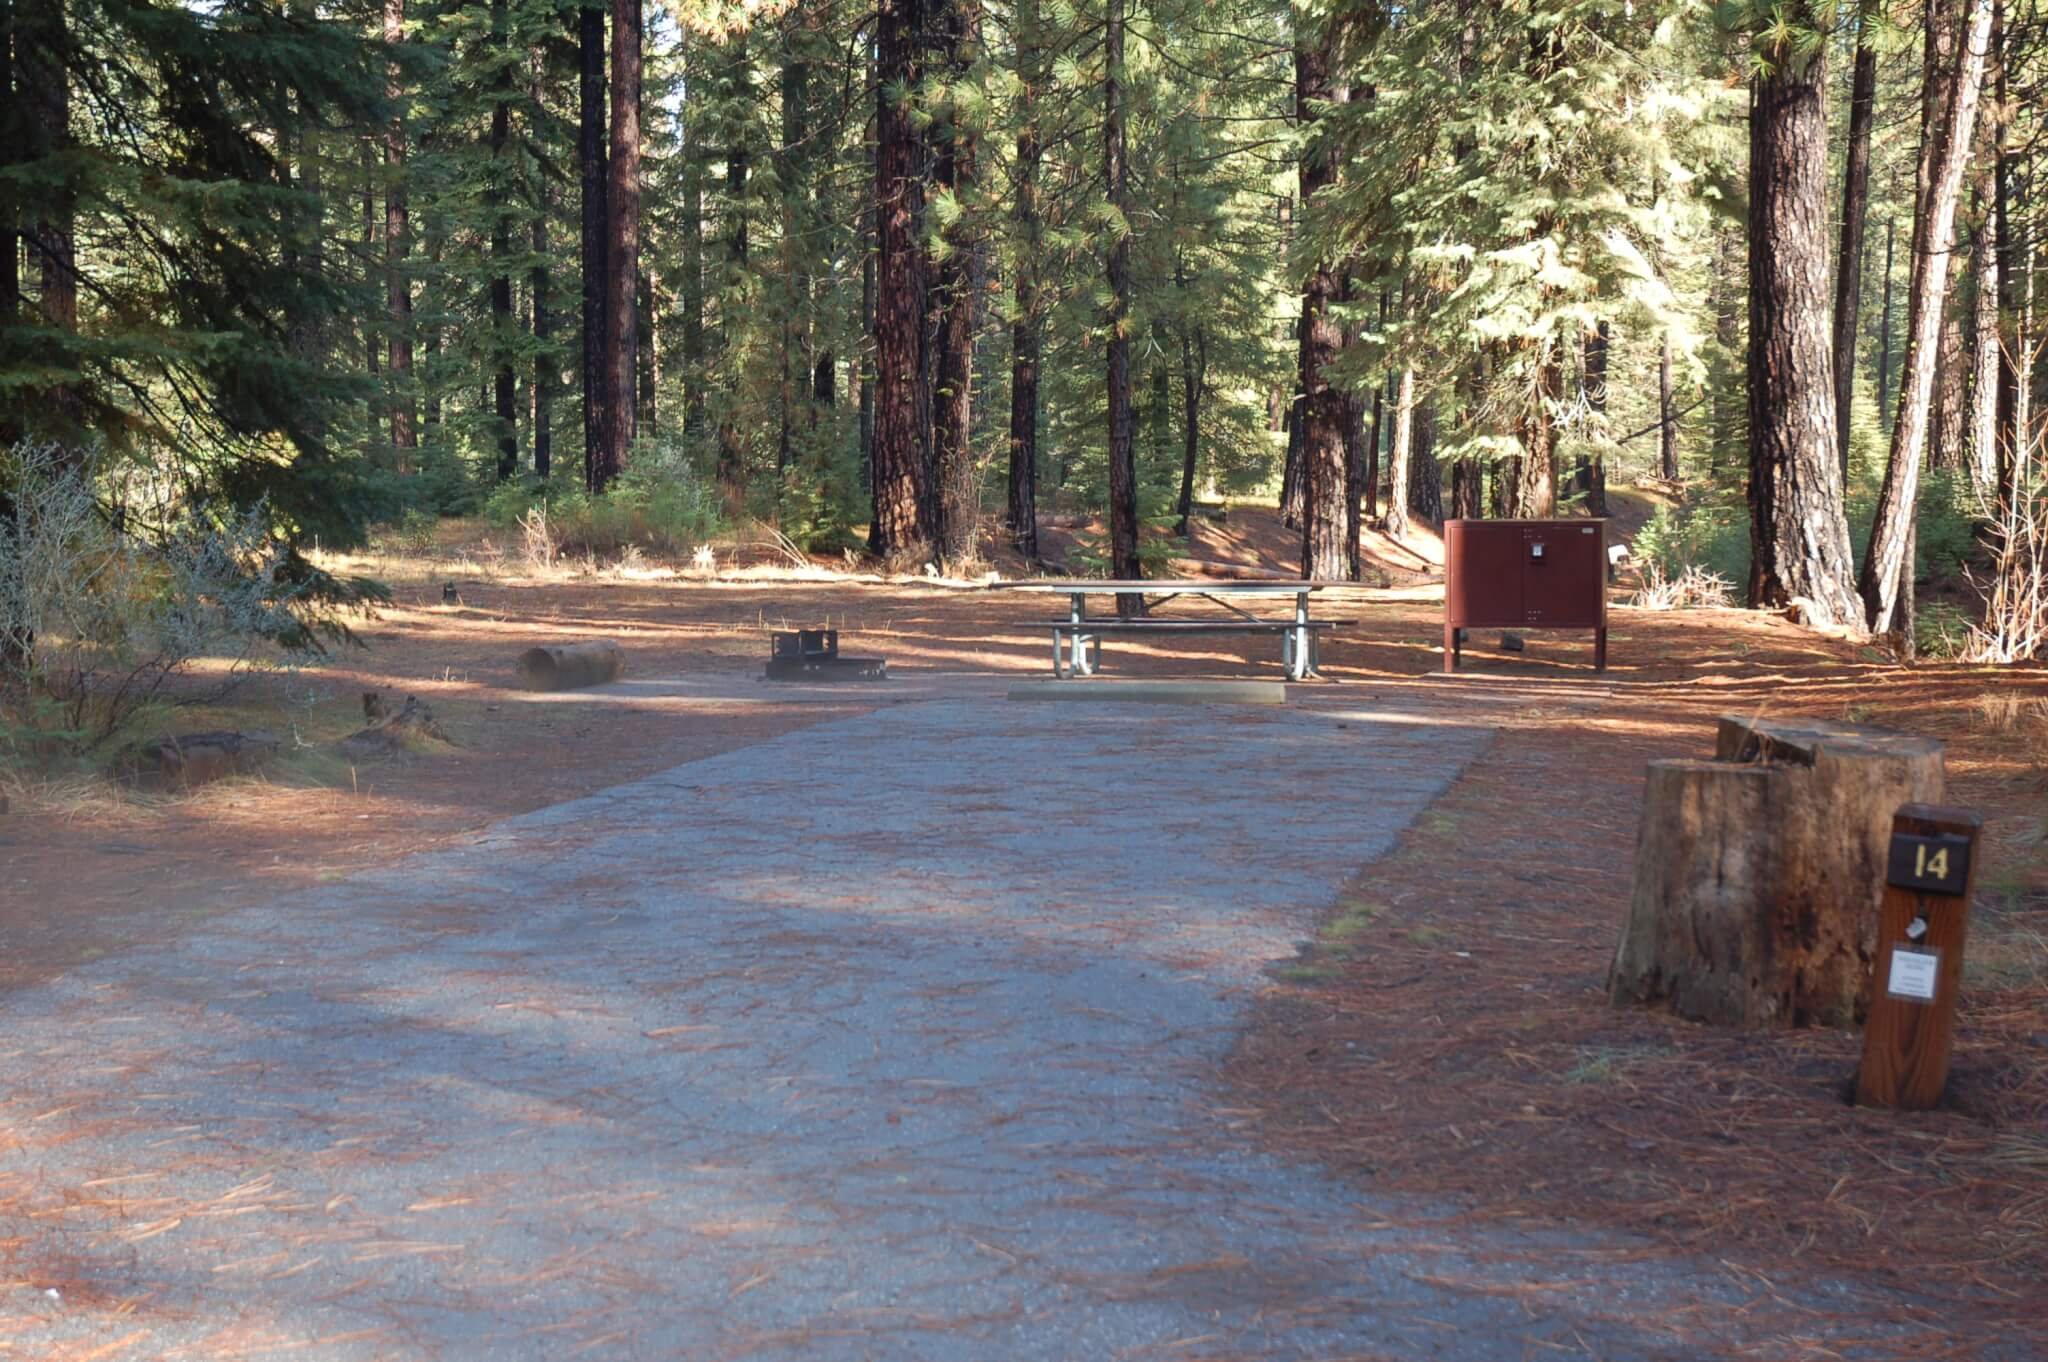 Cattle Camp - Site 14 - CampsitePhotos.com